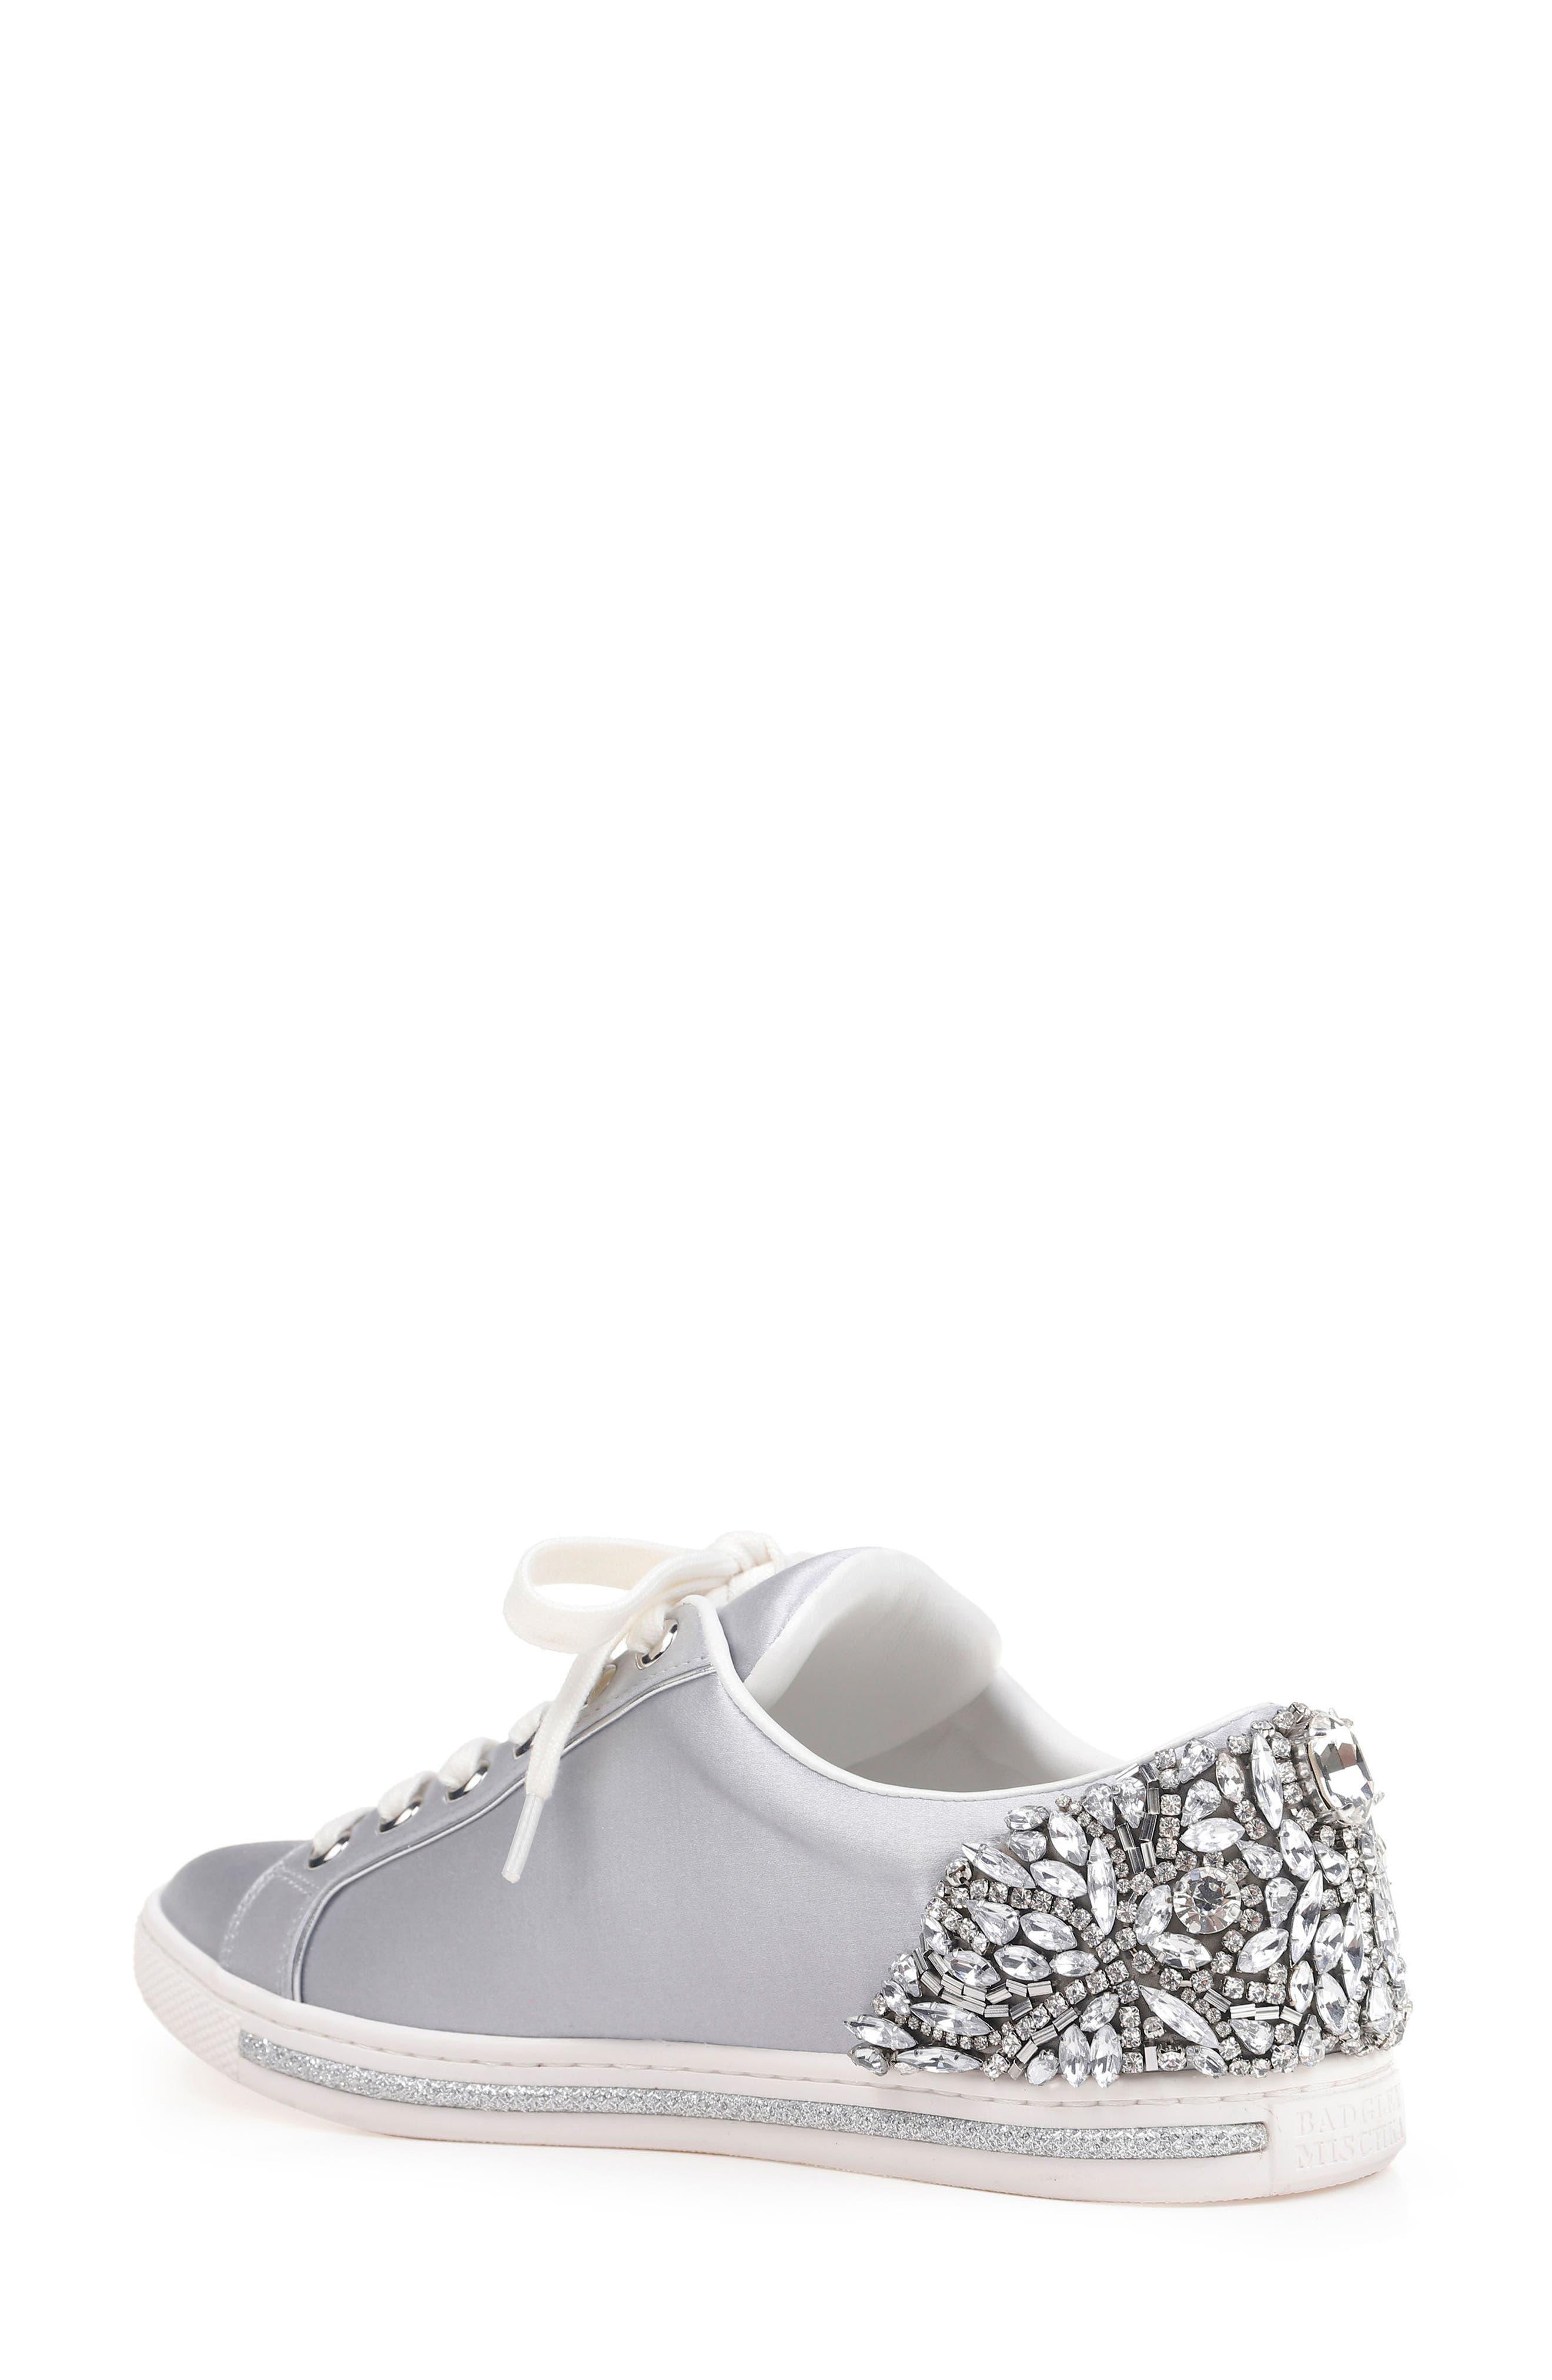 Badgley Mischka Shirley Crystal Embellished Sneaker,                             Alternate thumbnail 2, color,                             045